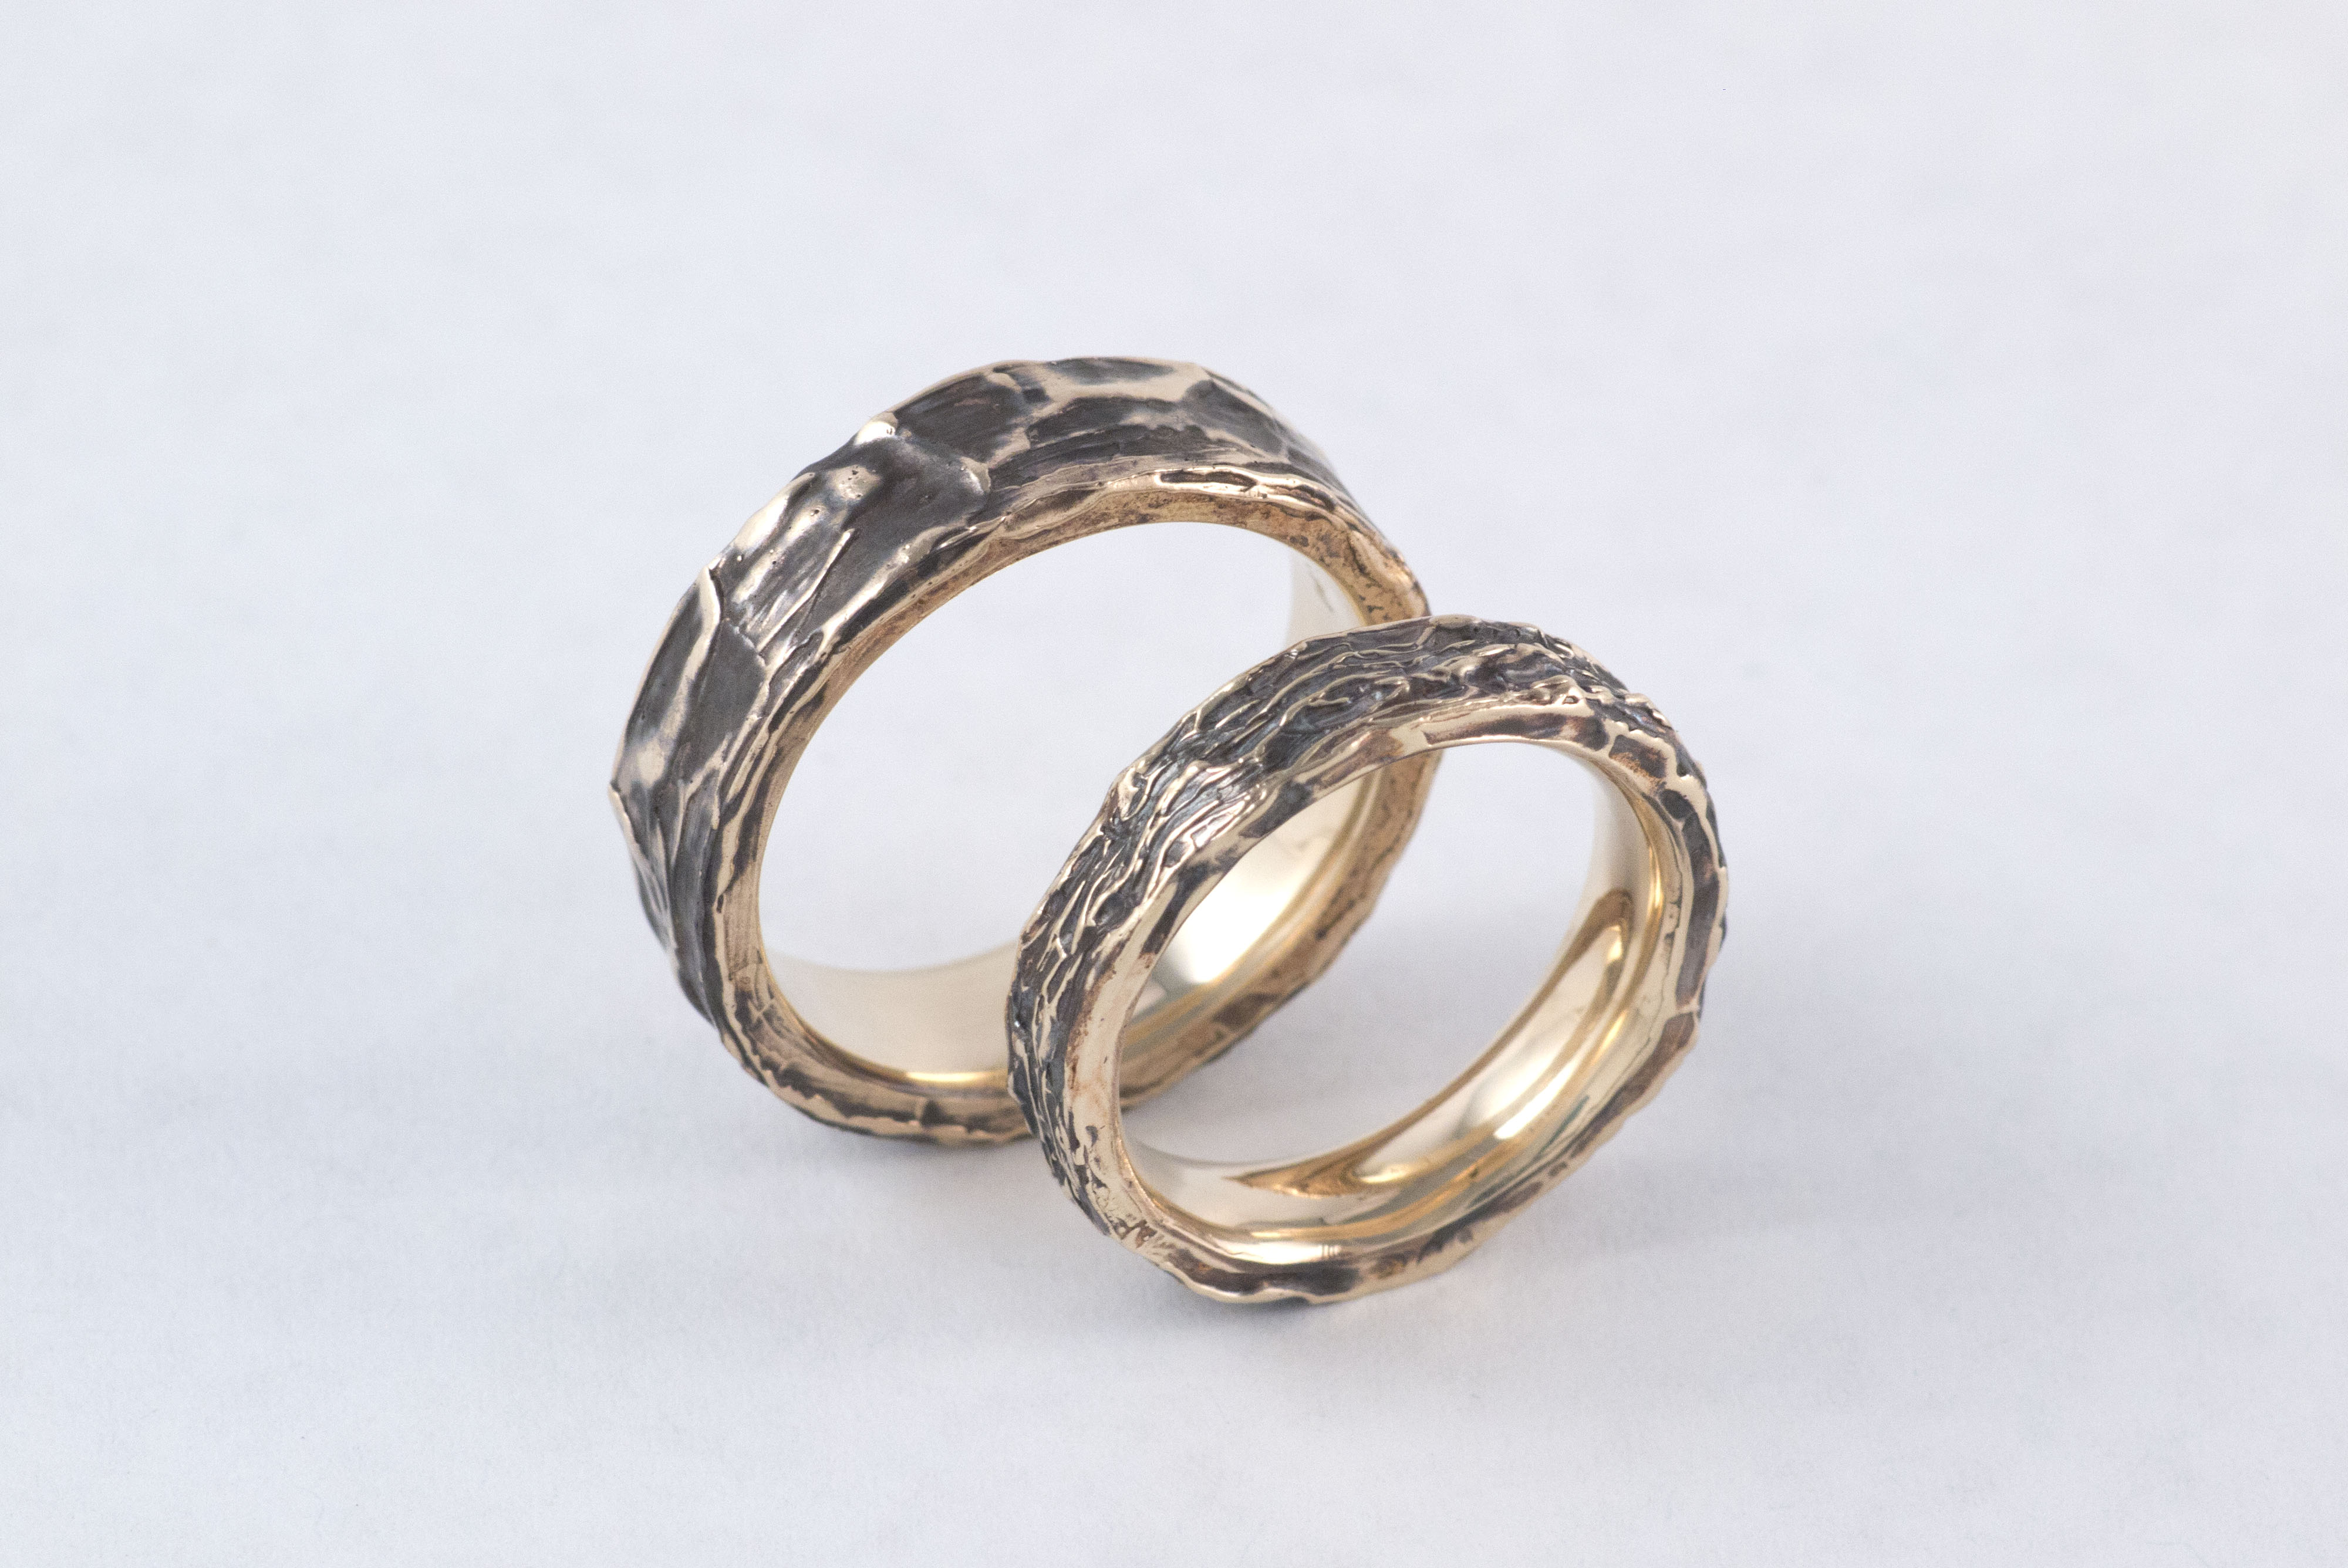 14k Yellow gold wedding rings, wedding bands